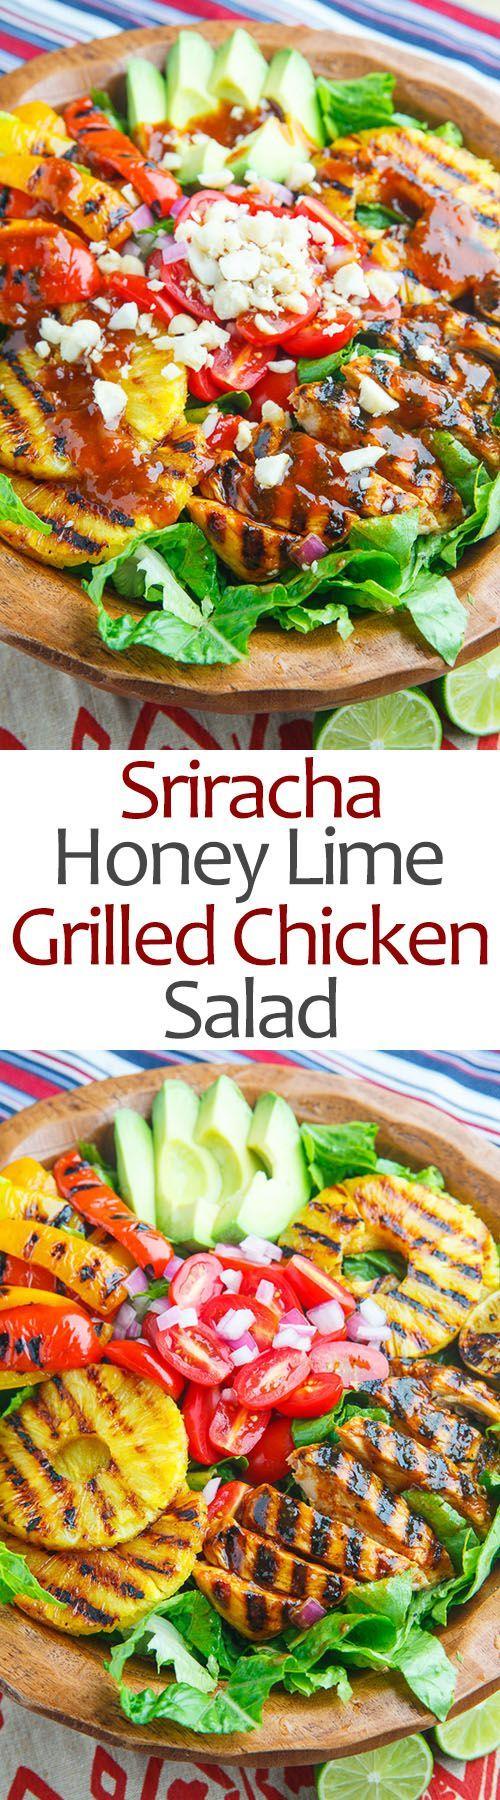 Sriracha Honey Lime Grilled Chicken and Pineapple Salad Recipe #honeylimechicken